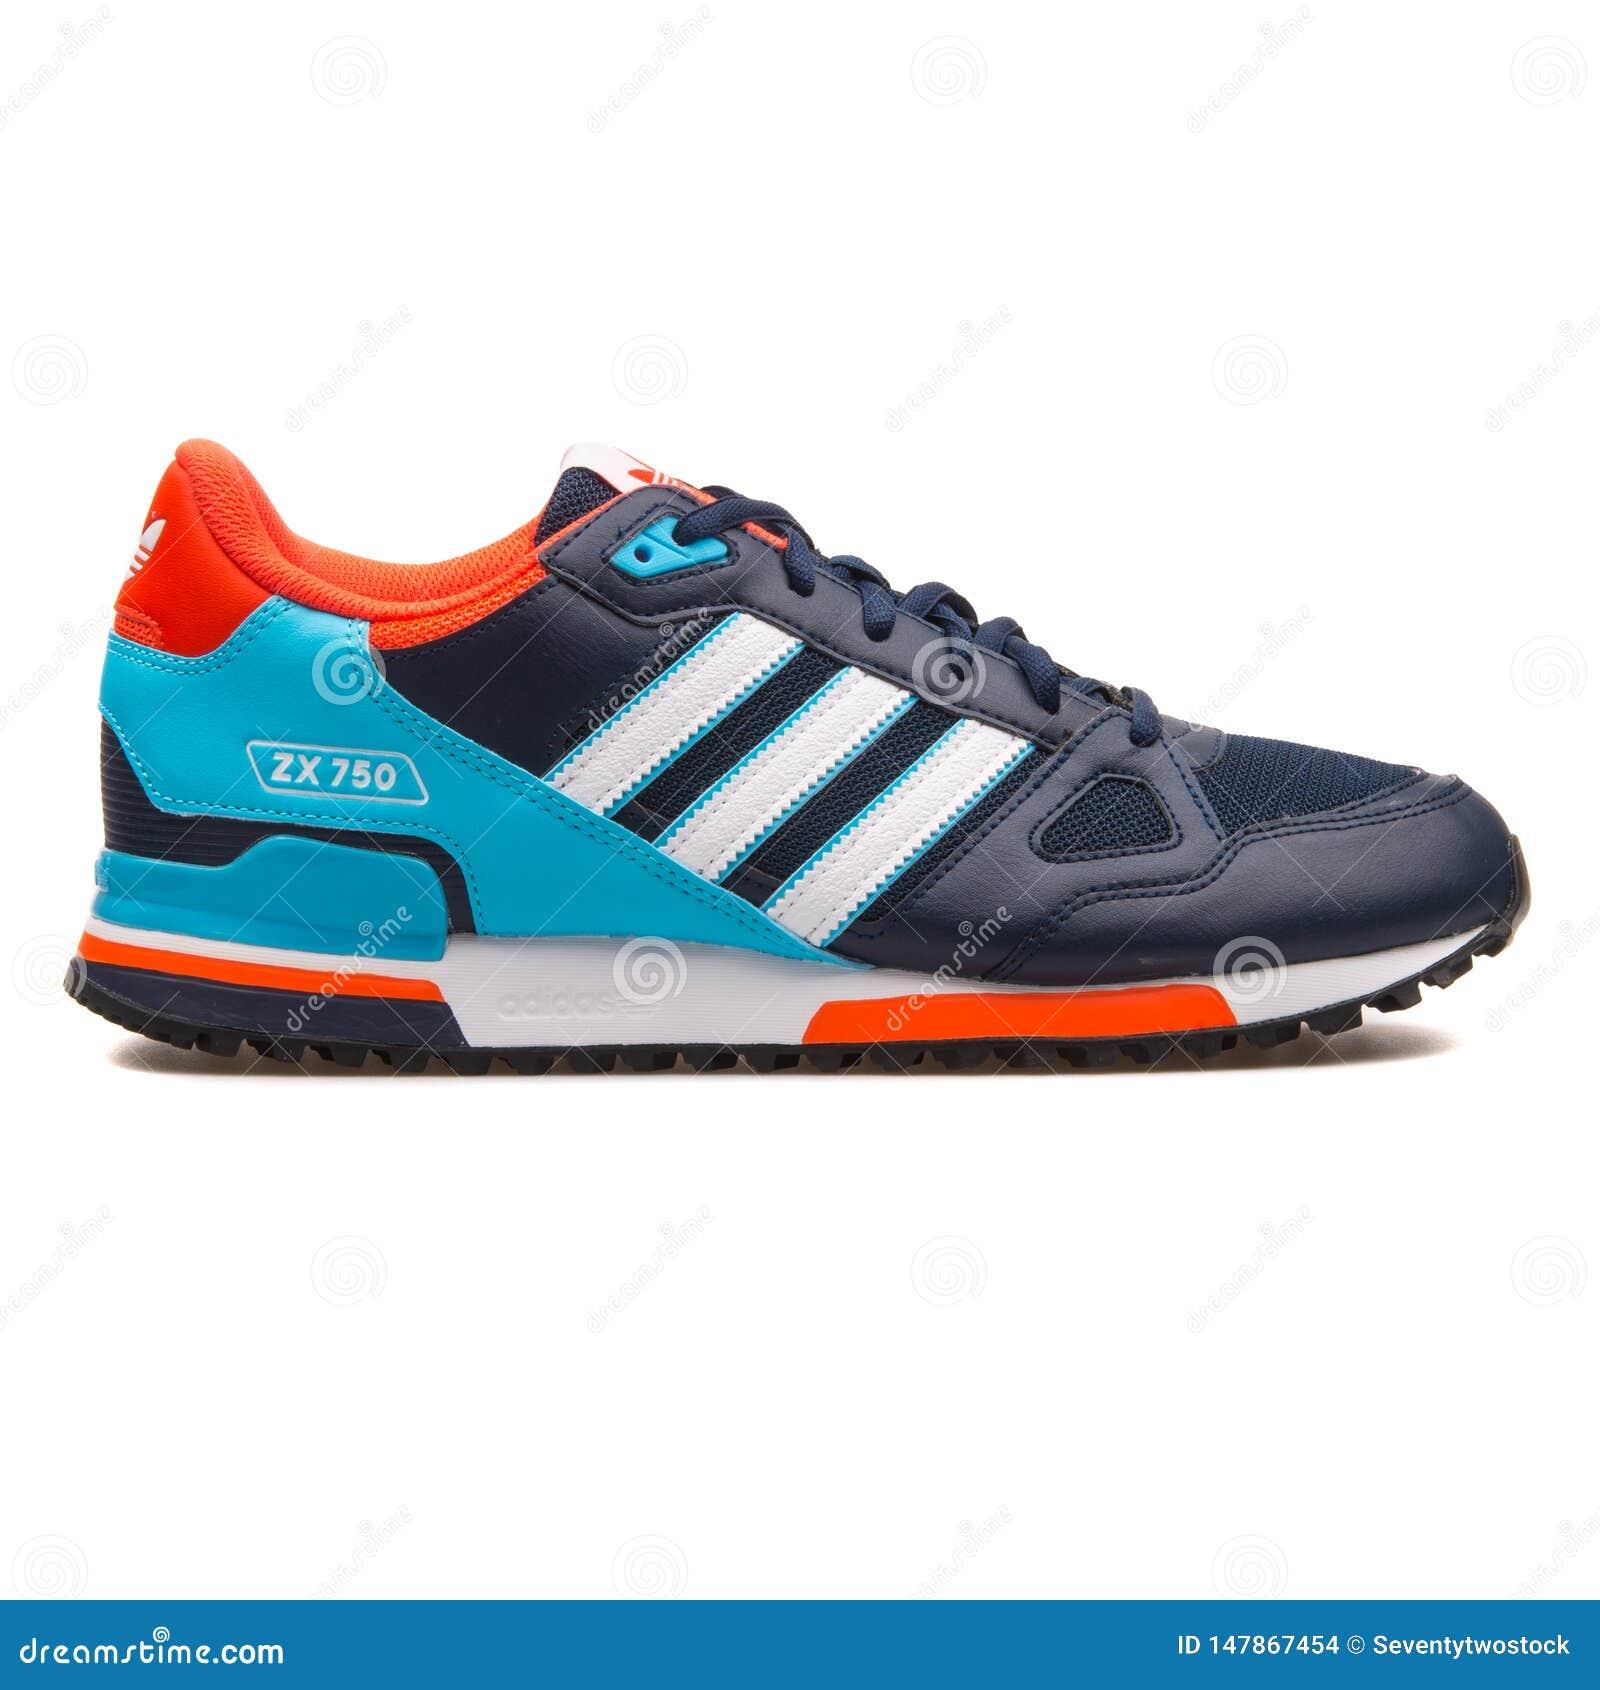 Adidas ZX 750 Navy Blue, Crimson And Cyan Sneaker Editorial